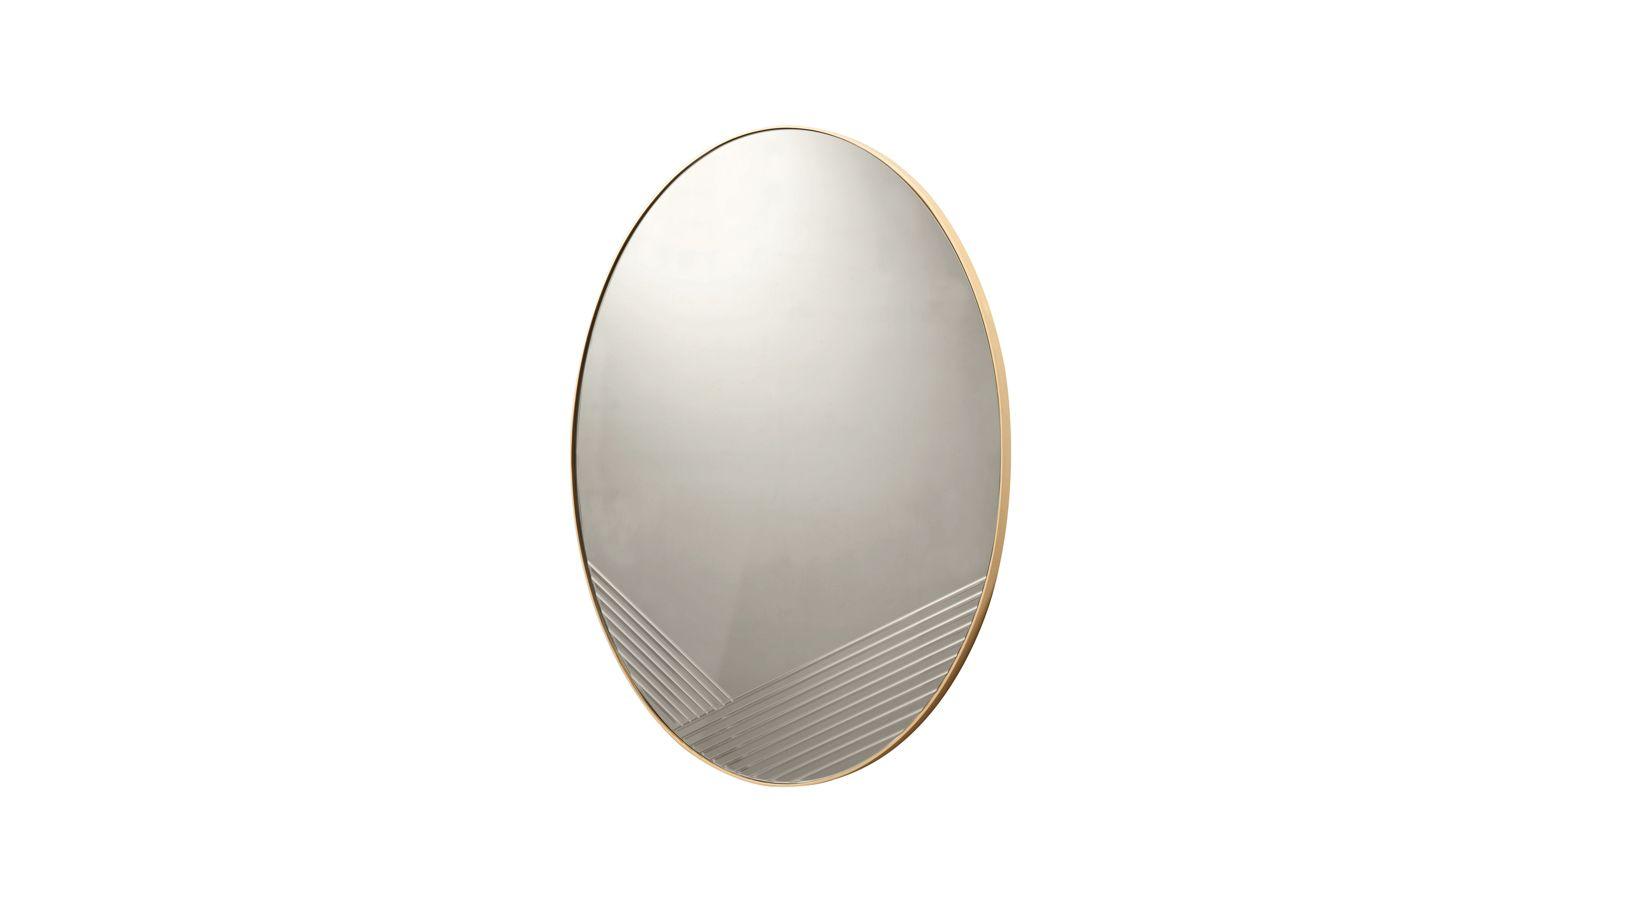 Focused mirror roche bobois for Miroir design roche bobois